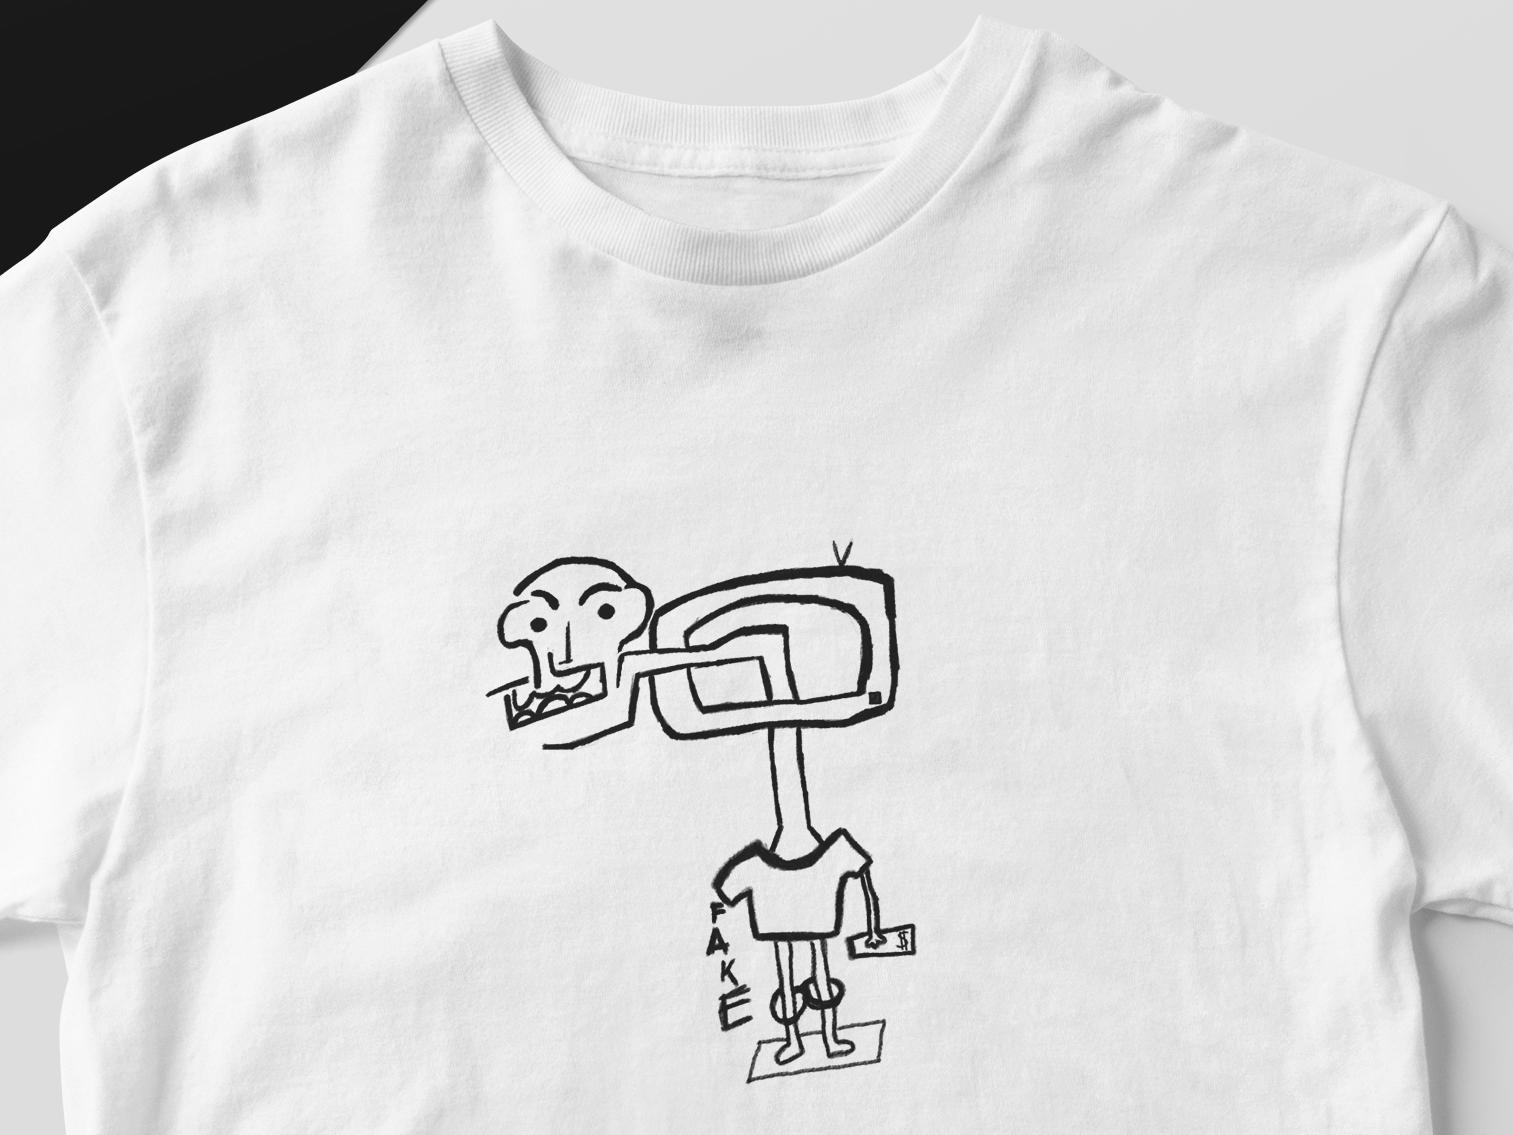 Fake fake news news media streetwear design t-shirt